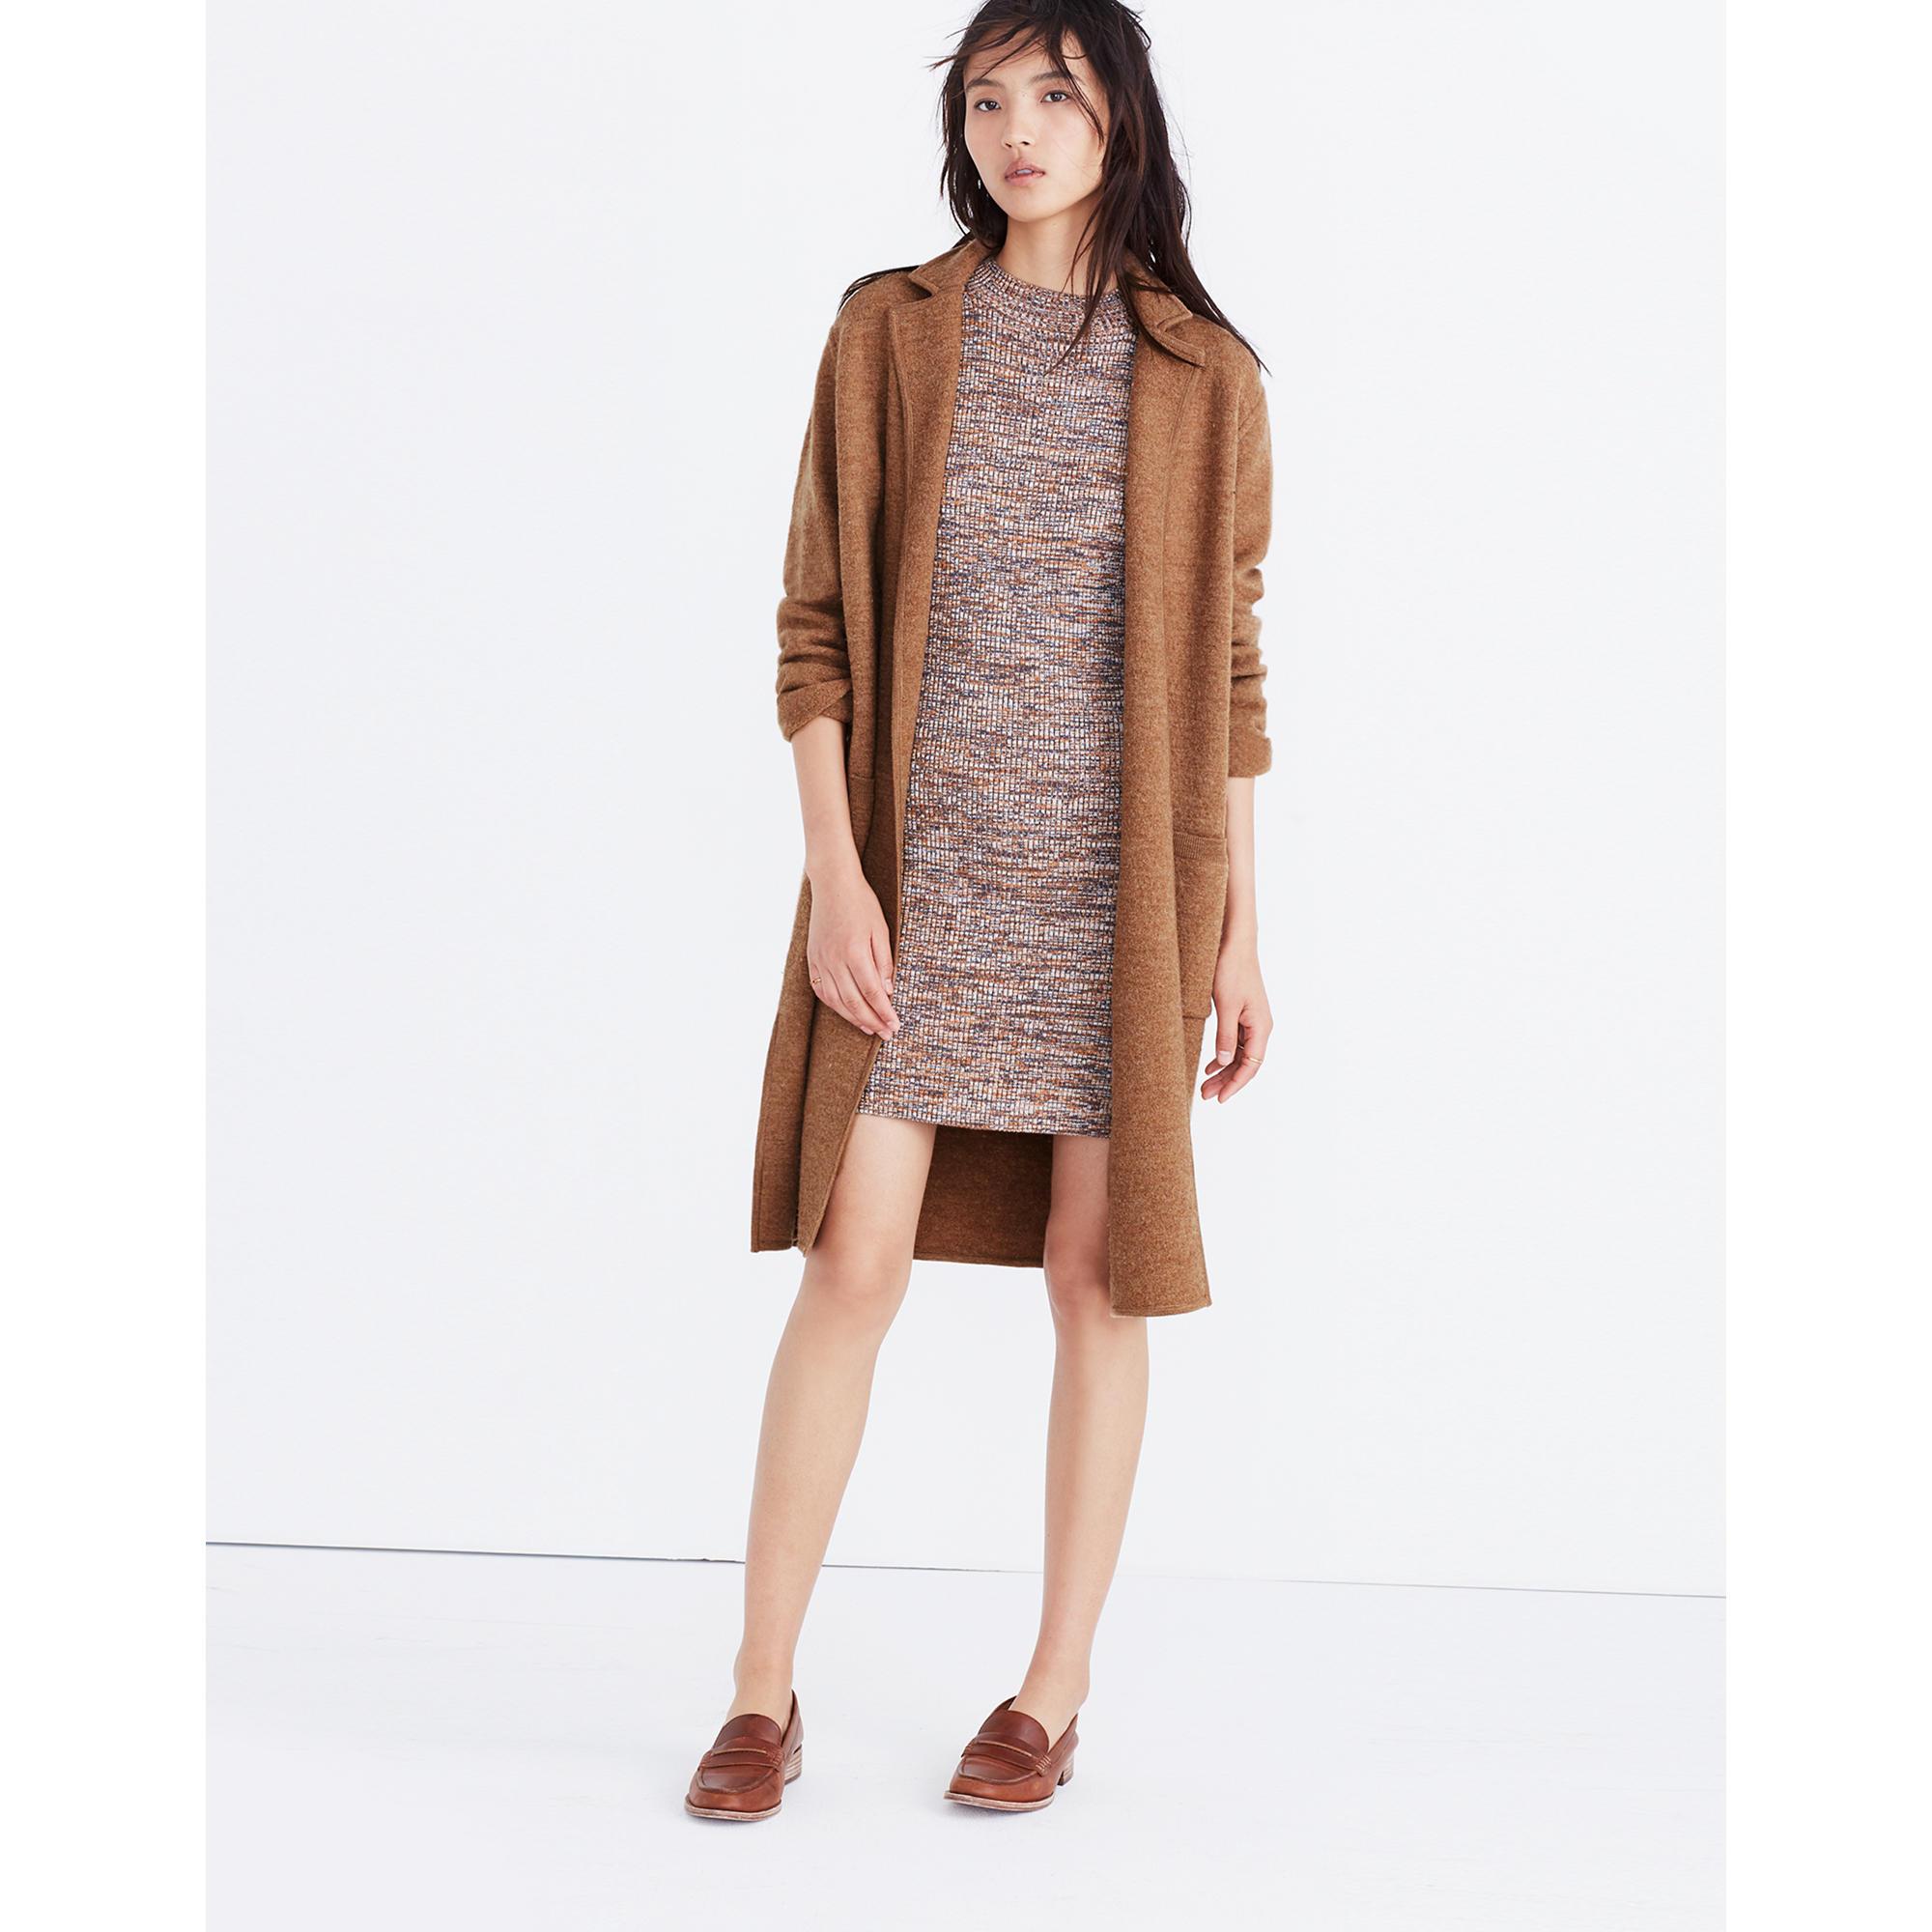 Camden Sweater-Coat : cardigans & sweater-jackets | Madewell